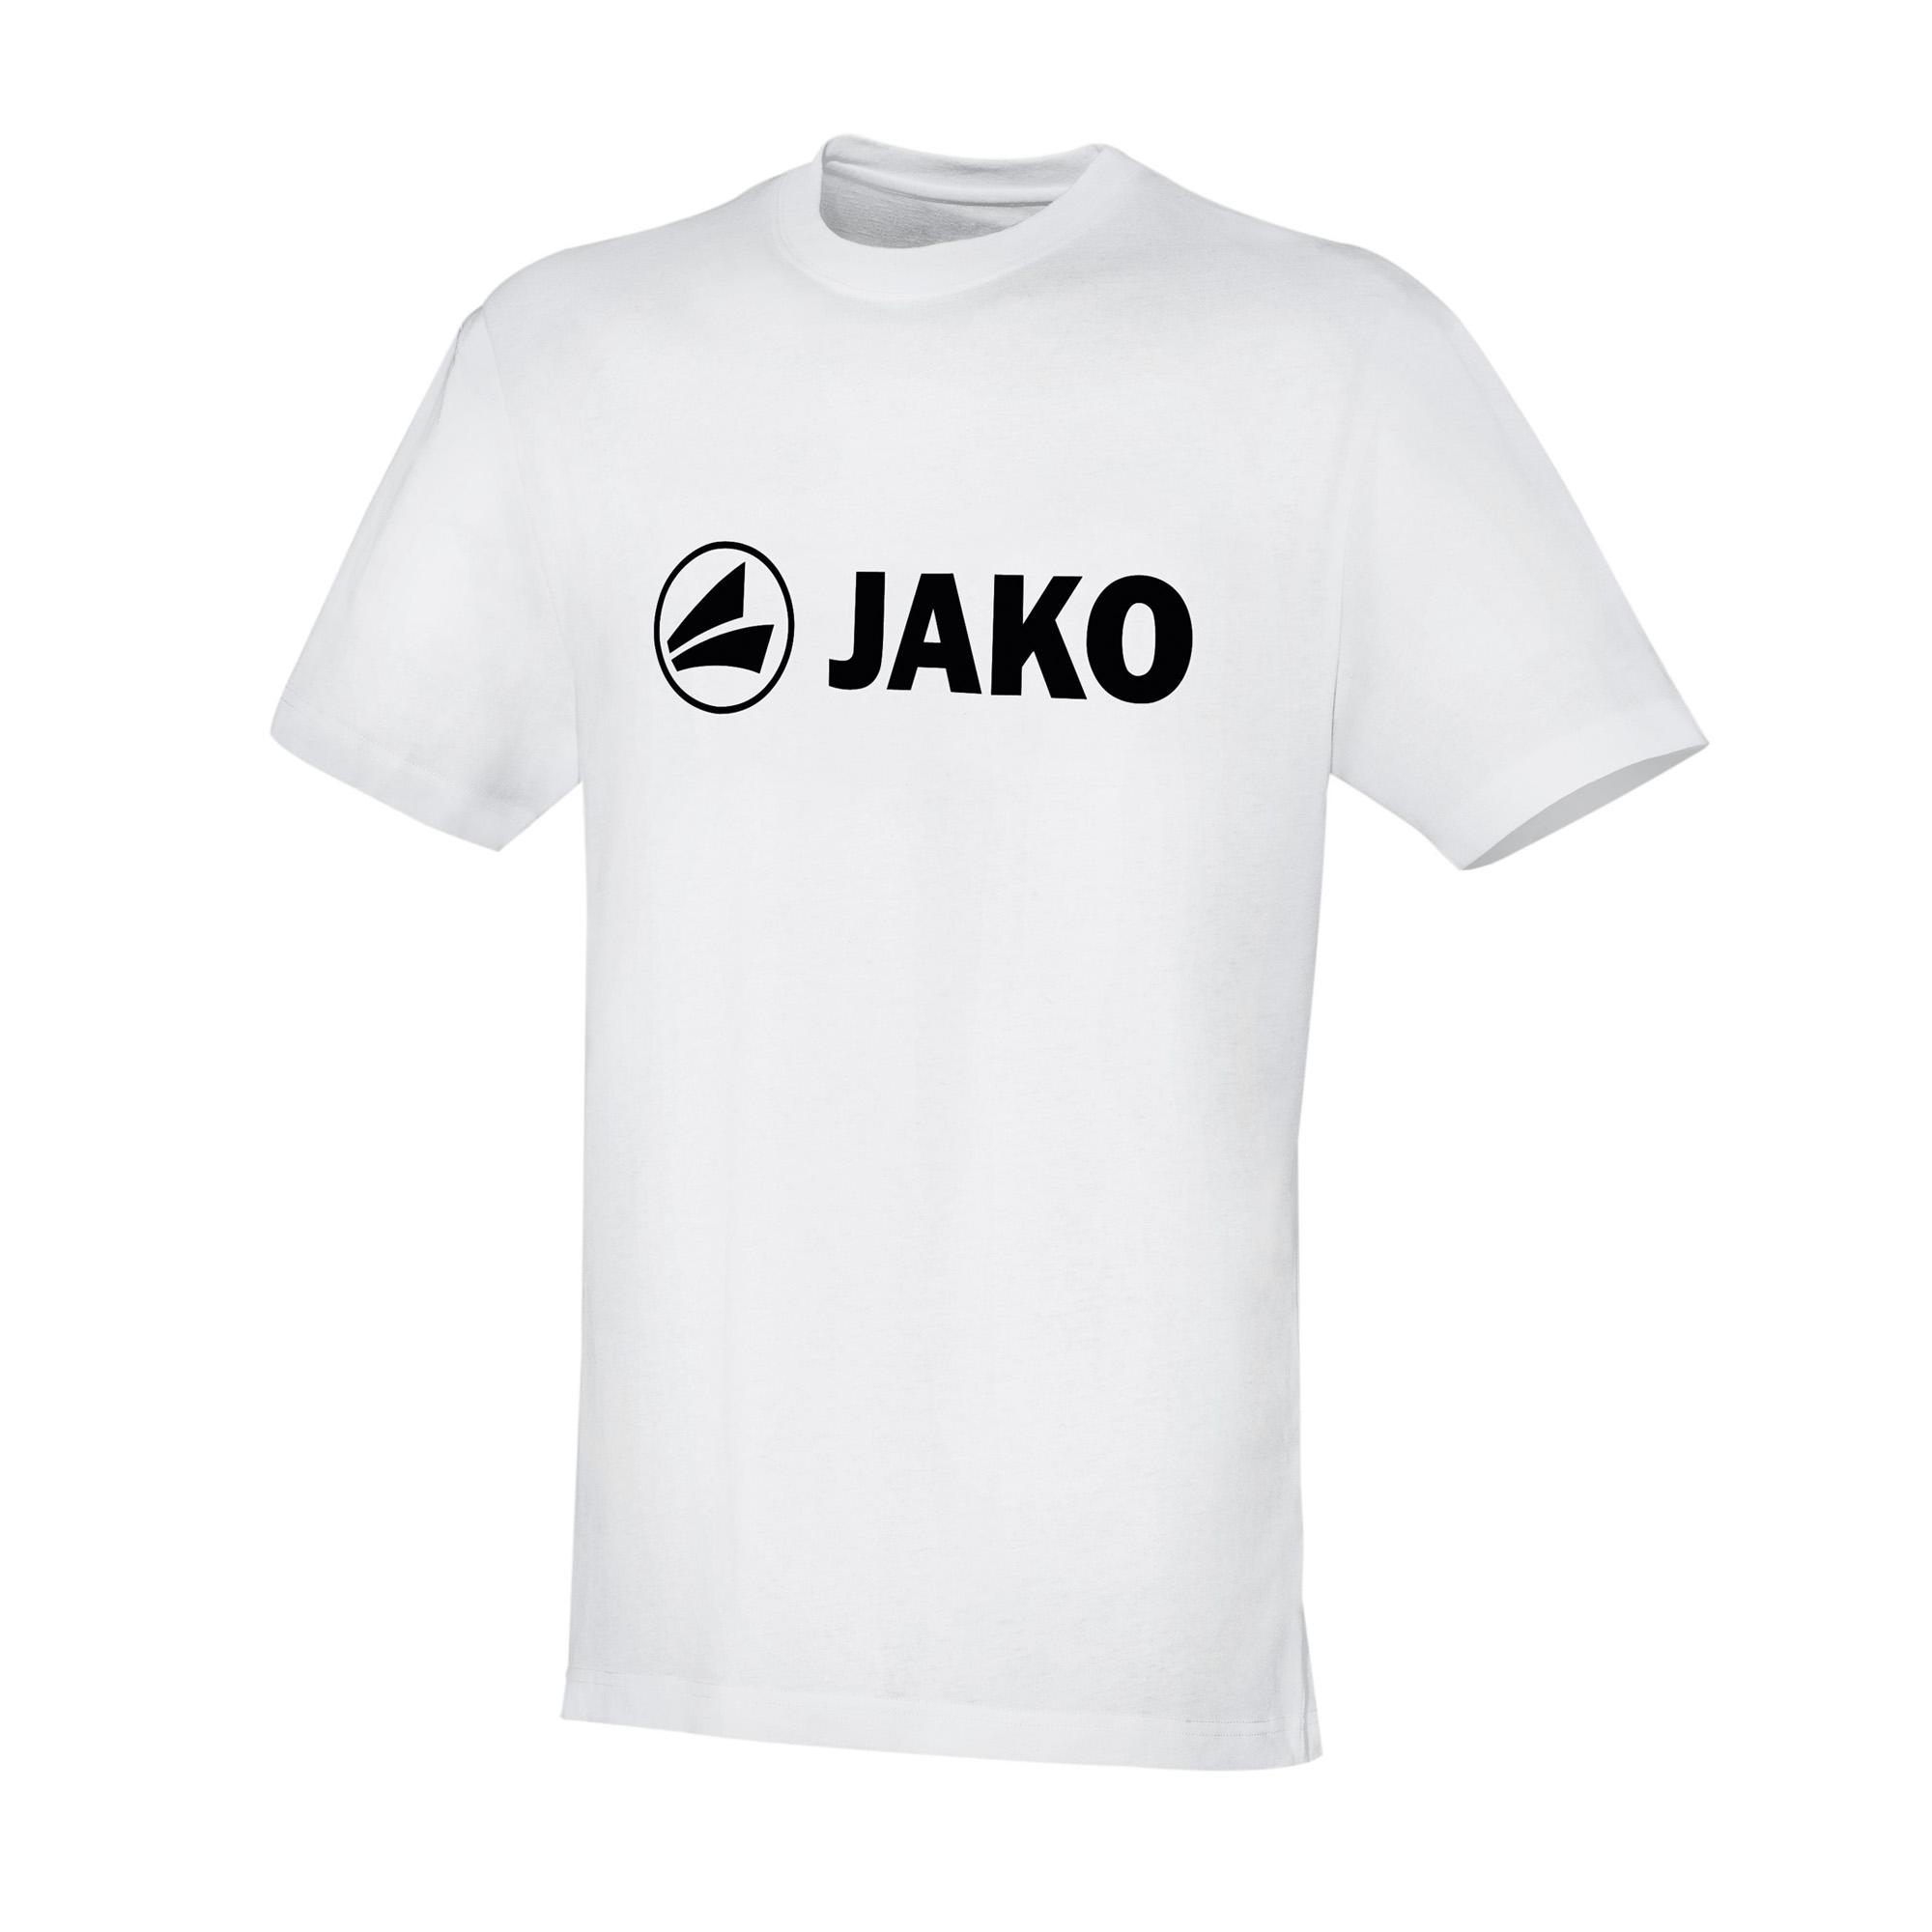 Jako Kinder T-Shirt Promo 6163-00 128